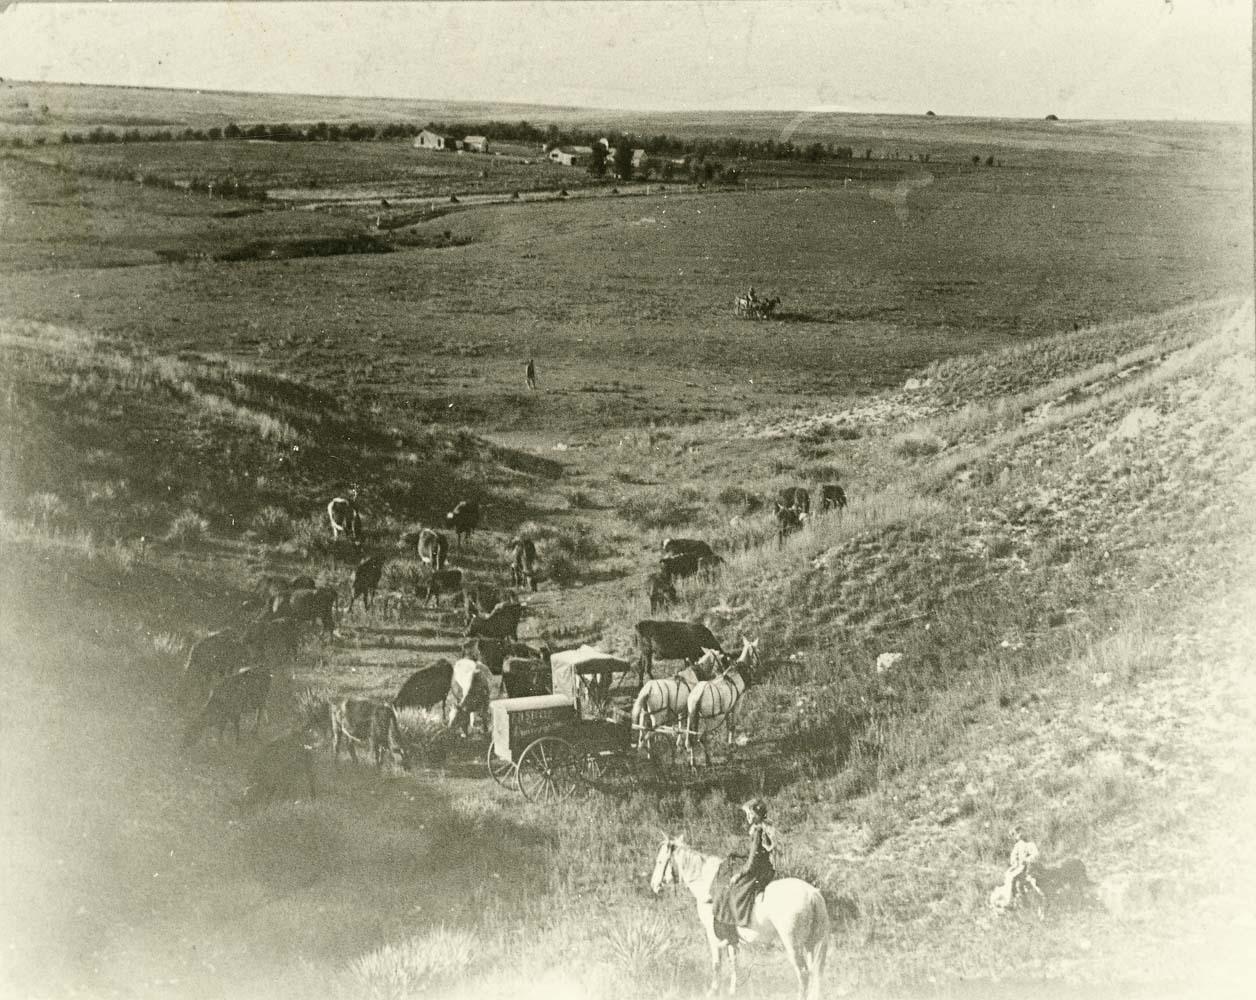 F. M. Steele's photography wagon